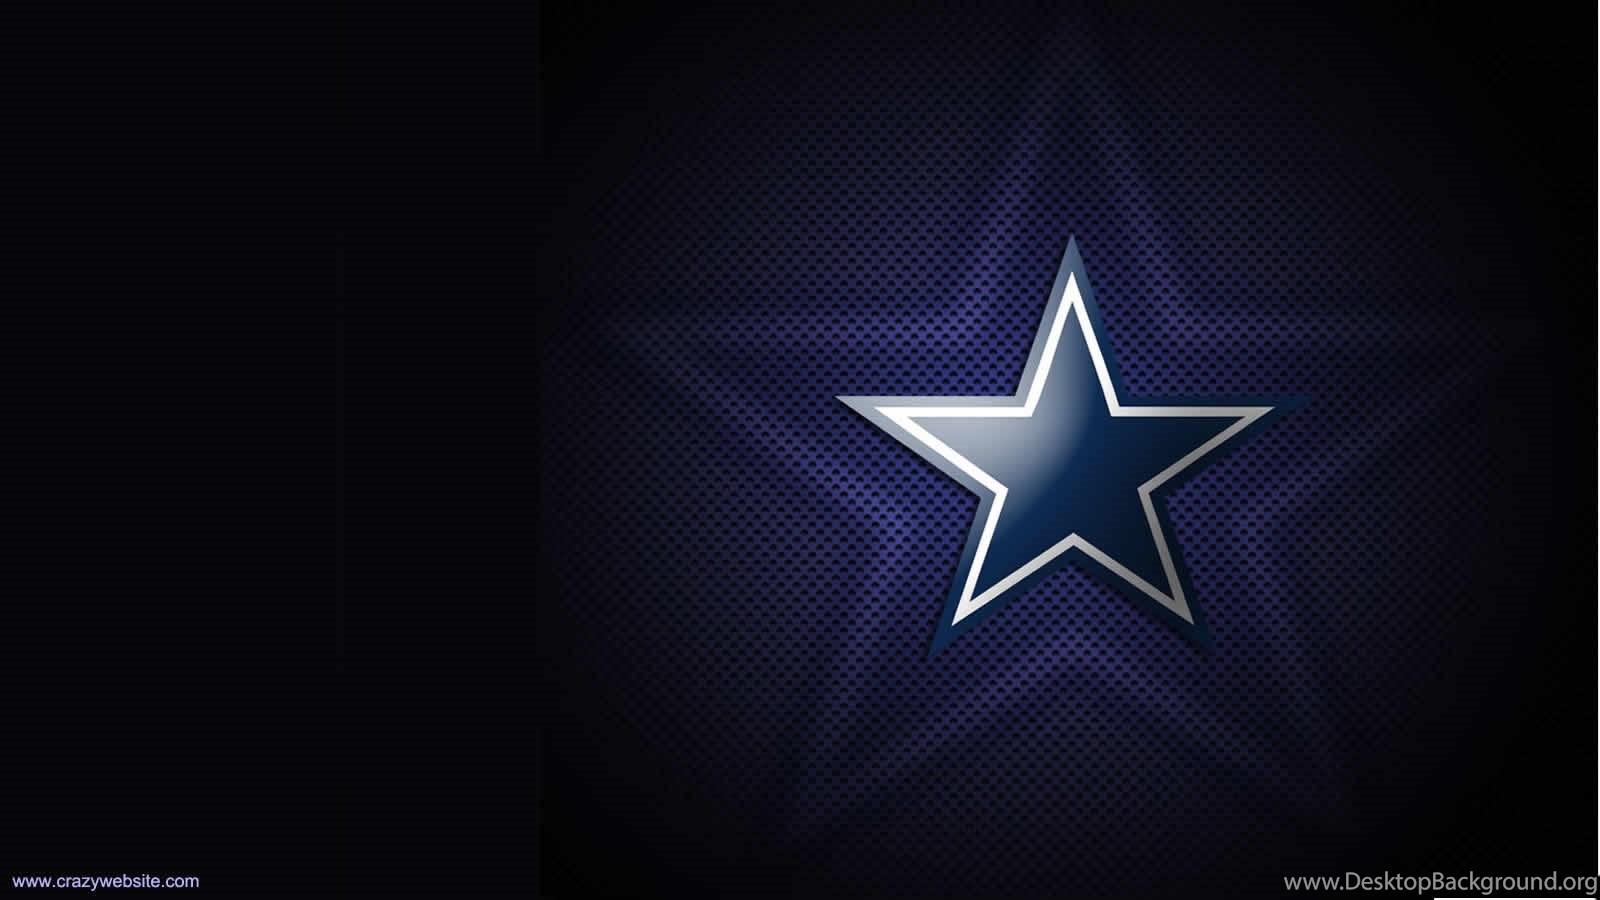 Dallas Cowboys Wallpapers A Desktop Background Jpg 1600x900 Wallpaper Widescreen